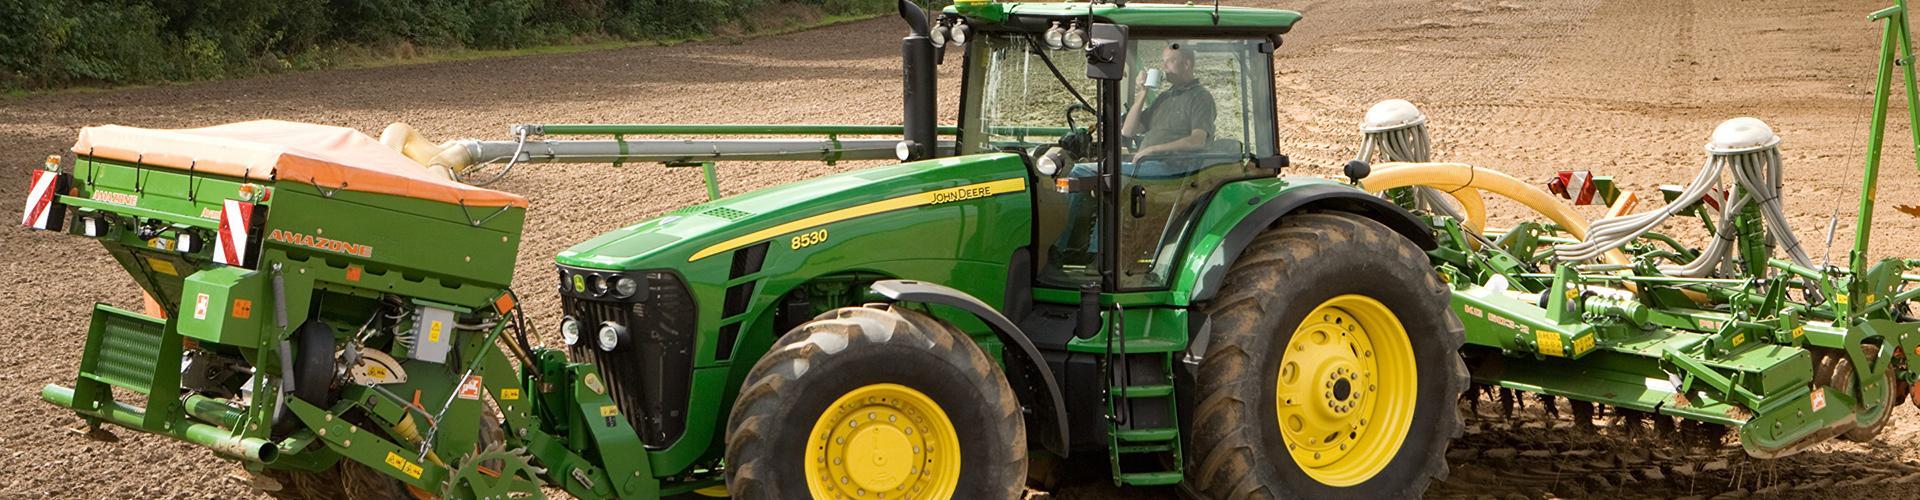 Картинки по запросу Запчасти для трактора JOHN DEERE